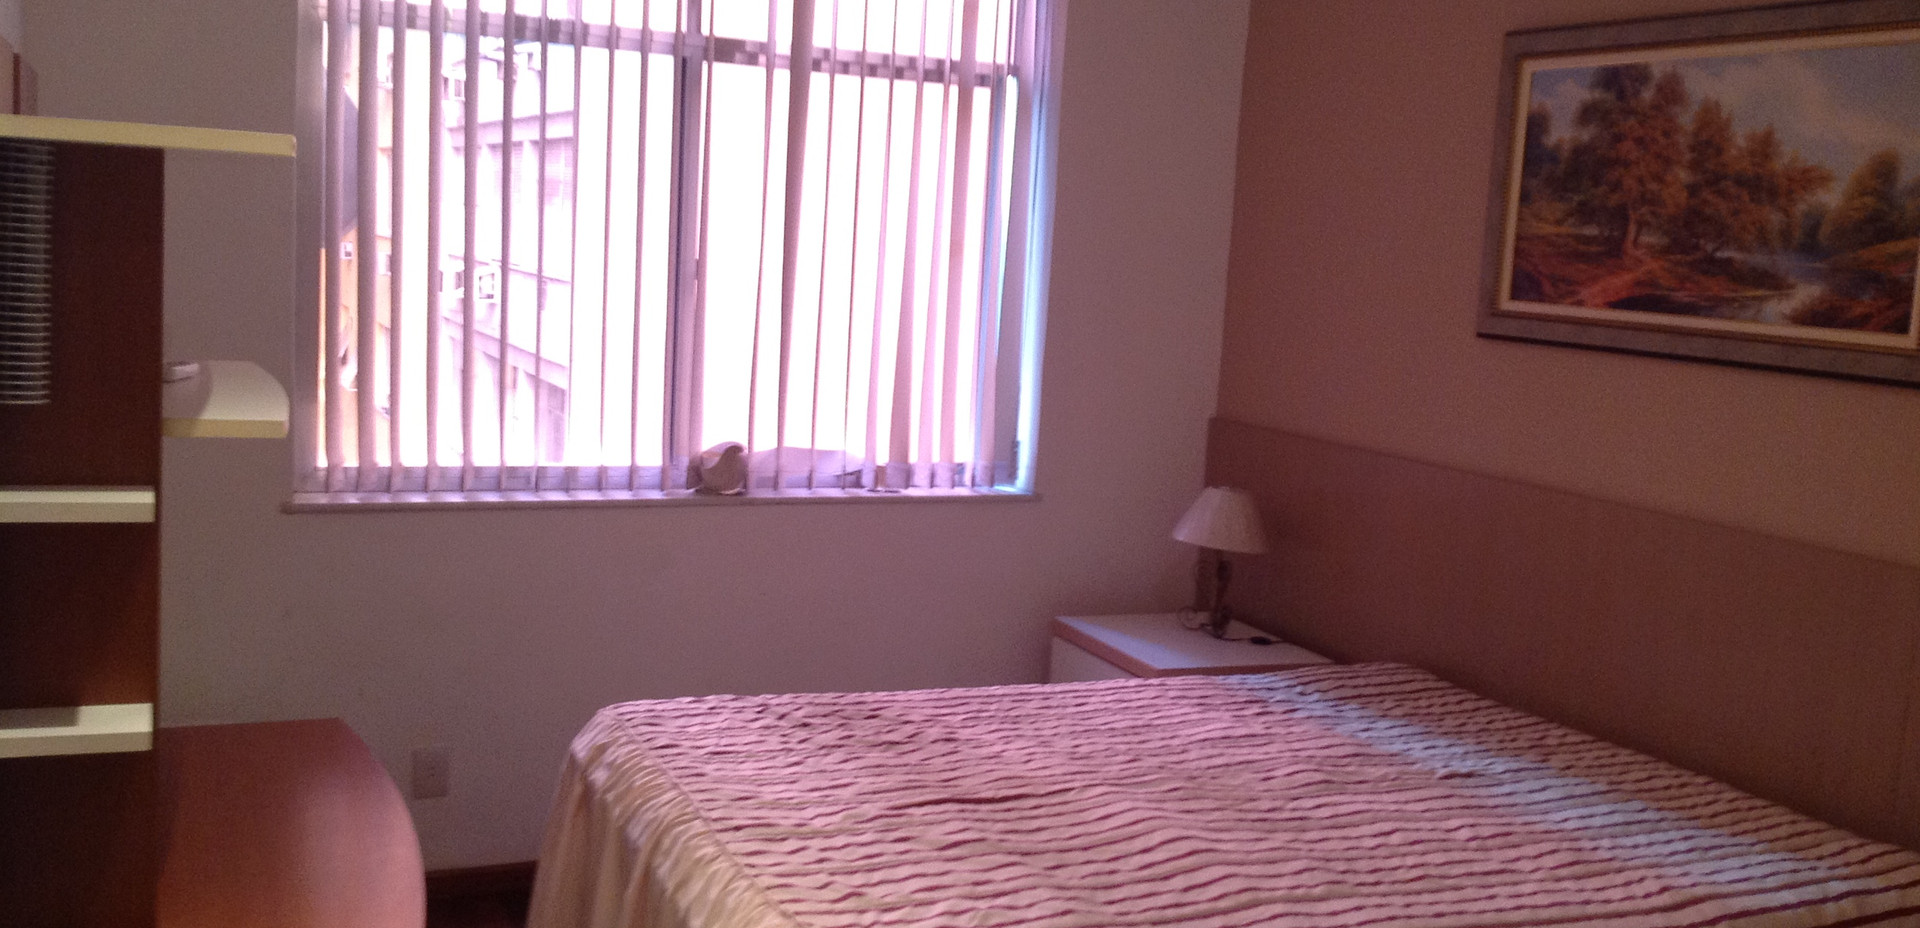 avenida copacabana 960 apt 406 jus 919.J